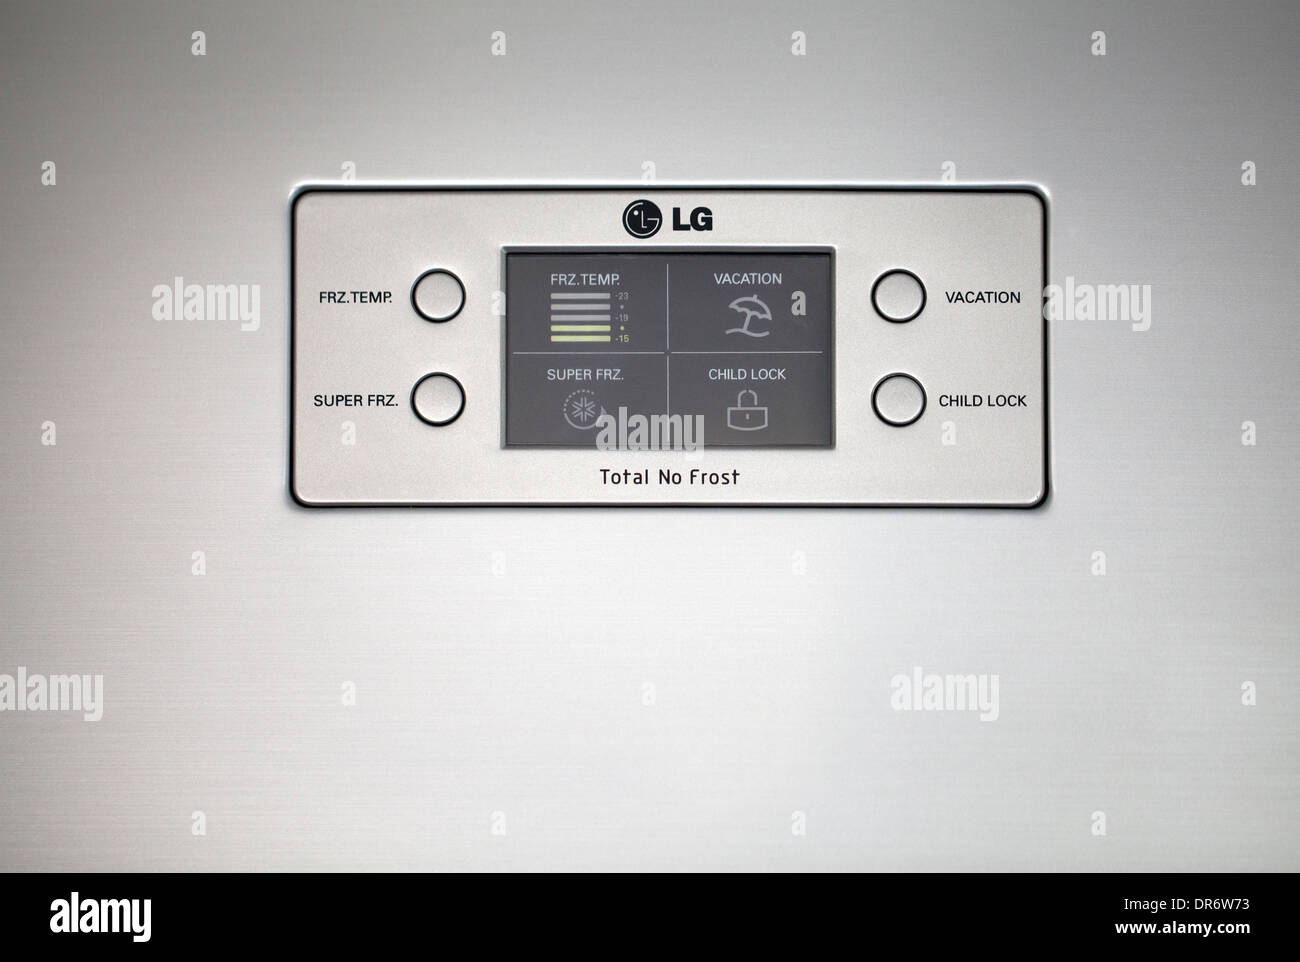 Kühlschrank No Frost A : Lg kühlschrank tür control panel stockfoto bild  alamy